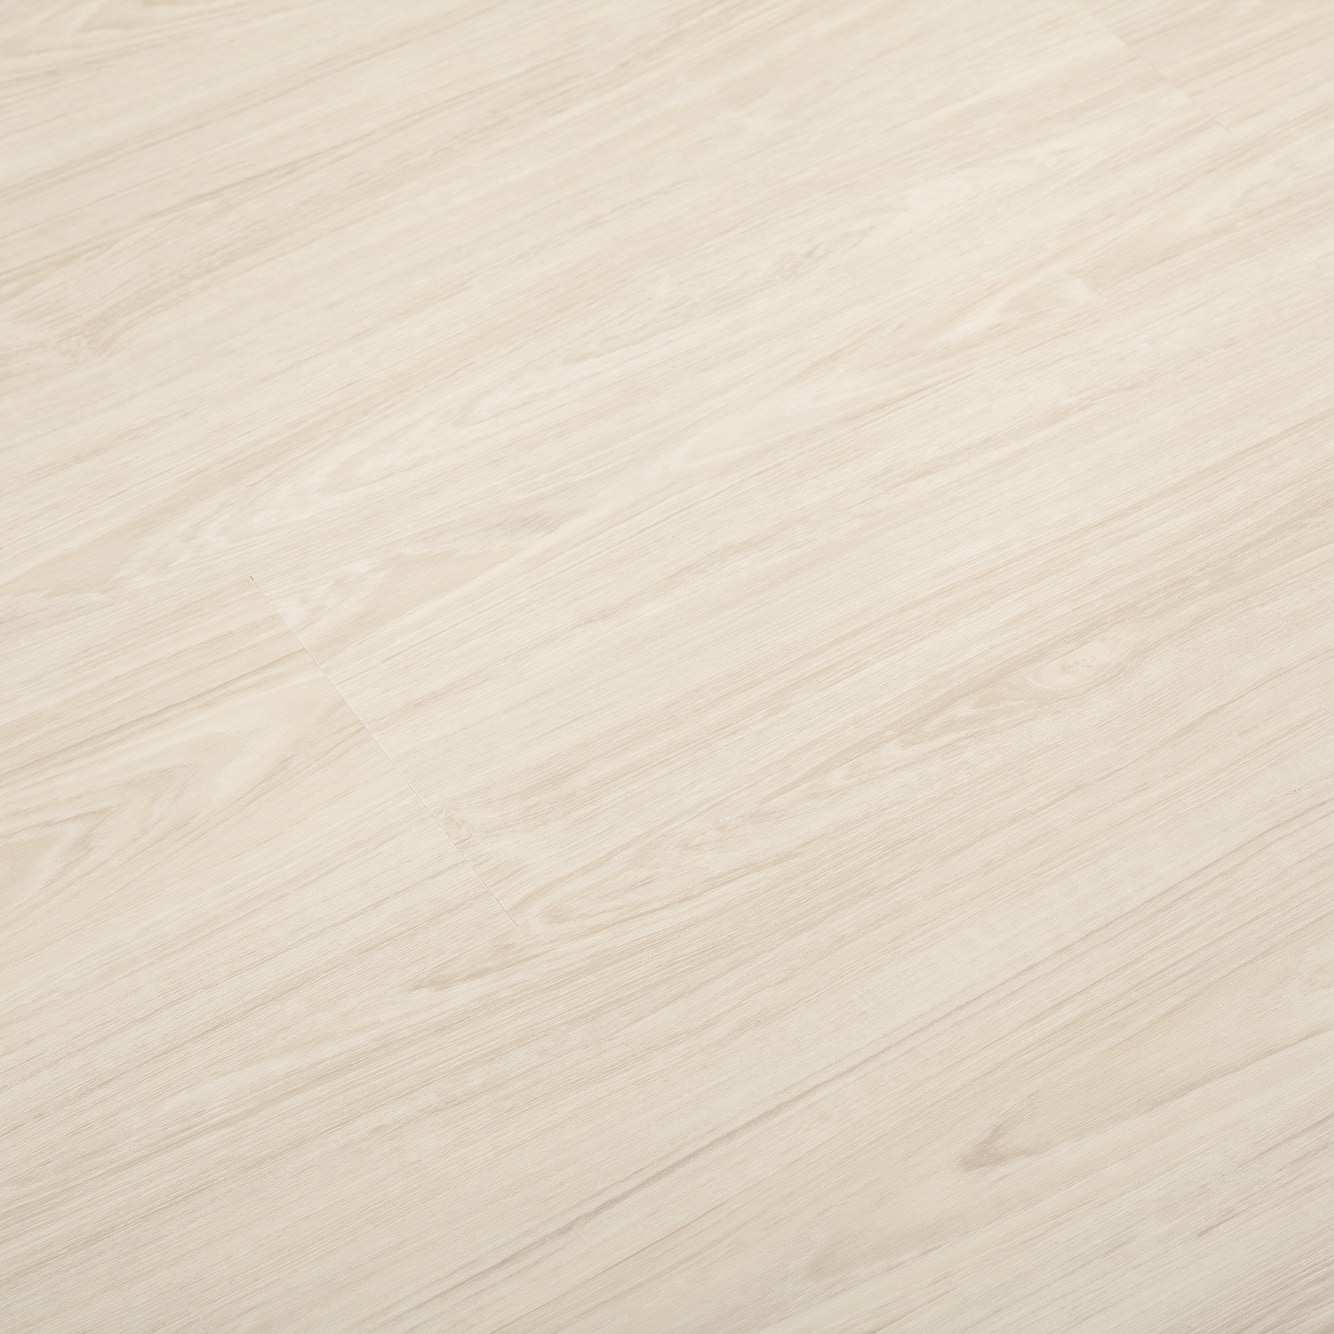 Atlanta White Oak / 7mm / SPC / Click Lock Vinyl Planks - 7mm SPC Click Lock - XL Route 66 Collection 0